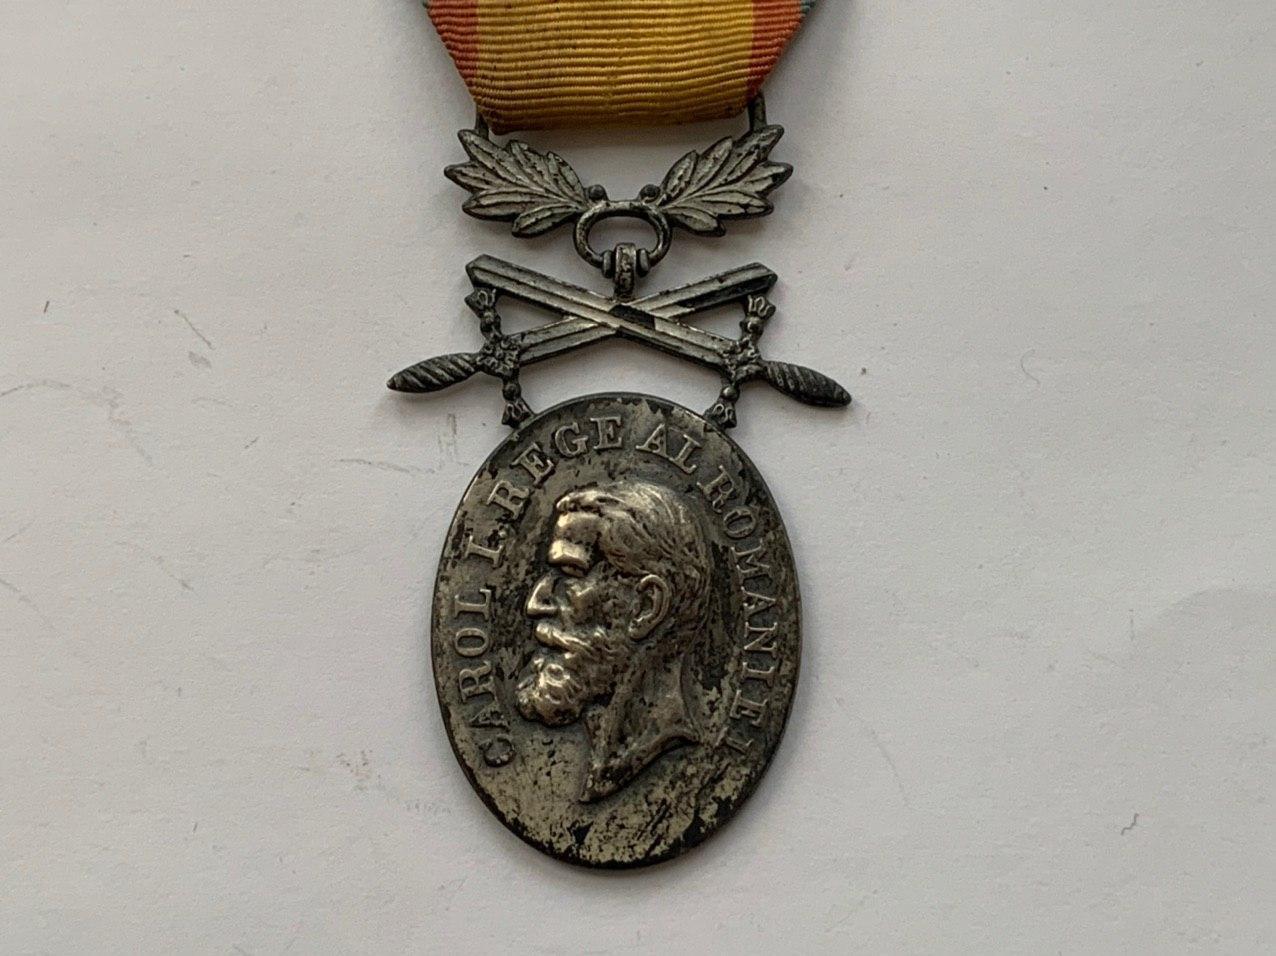 Medal for HARDIHOOD and LOYALTY